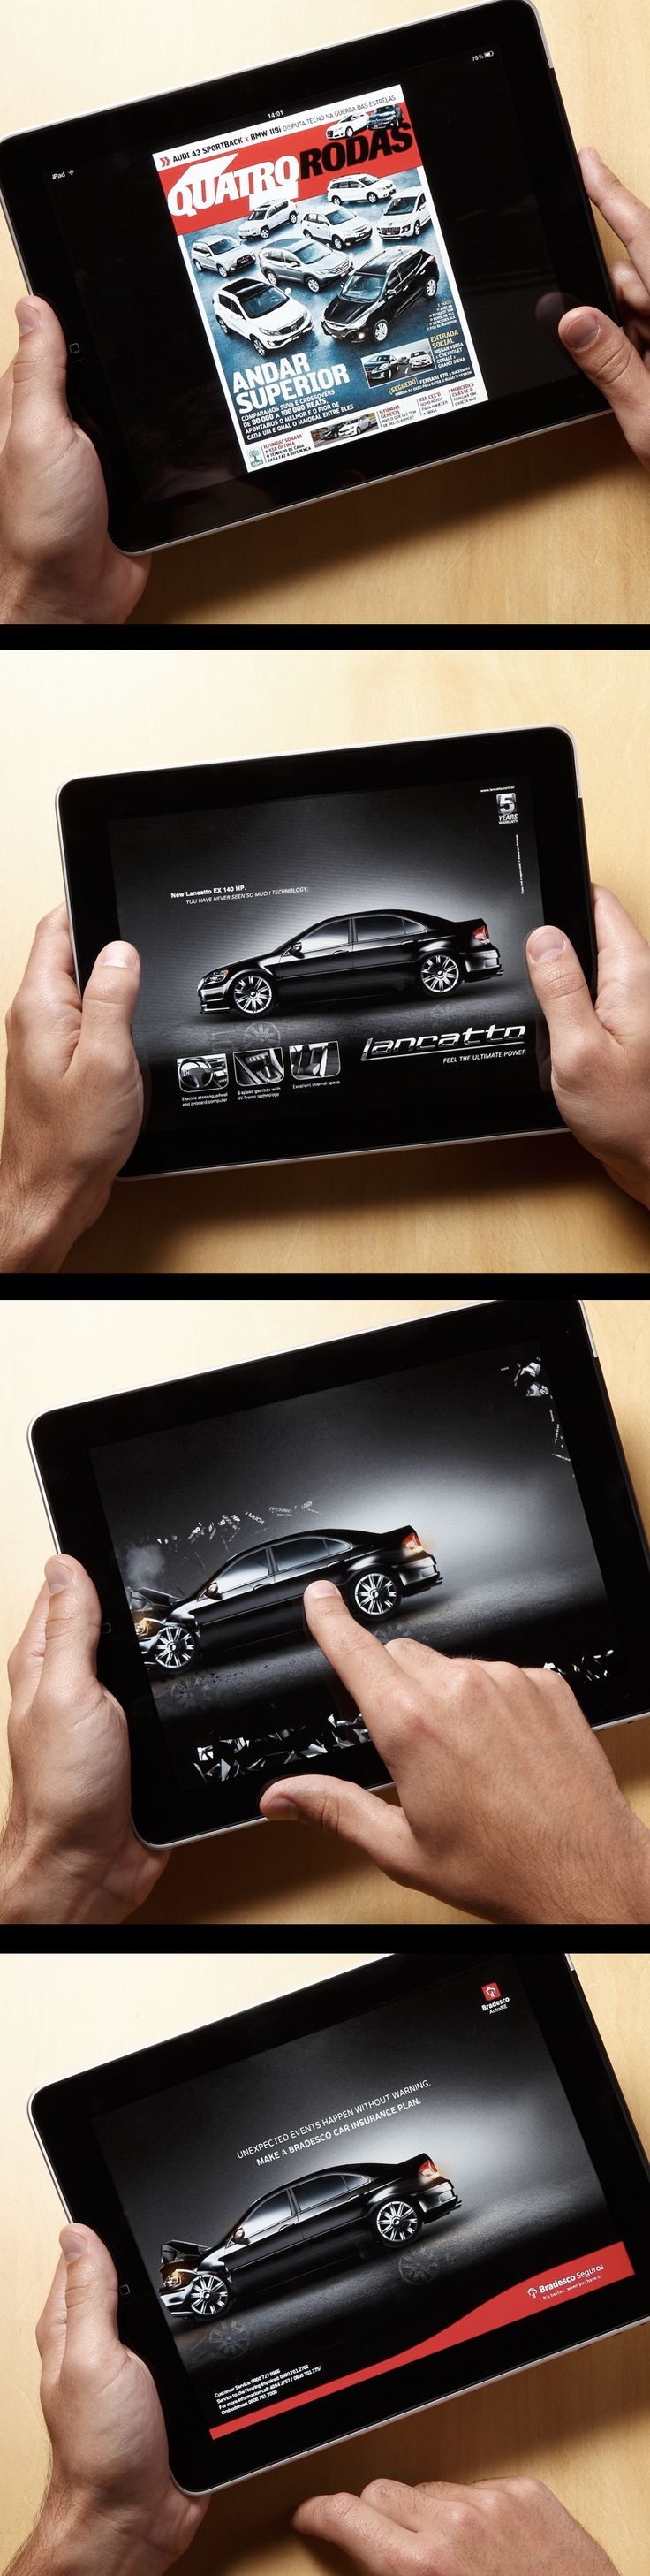 Bradesco - iPad magazines Fake ad